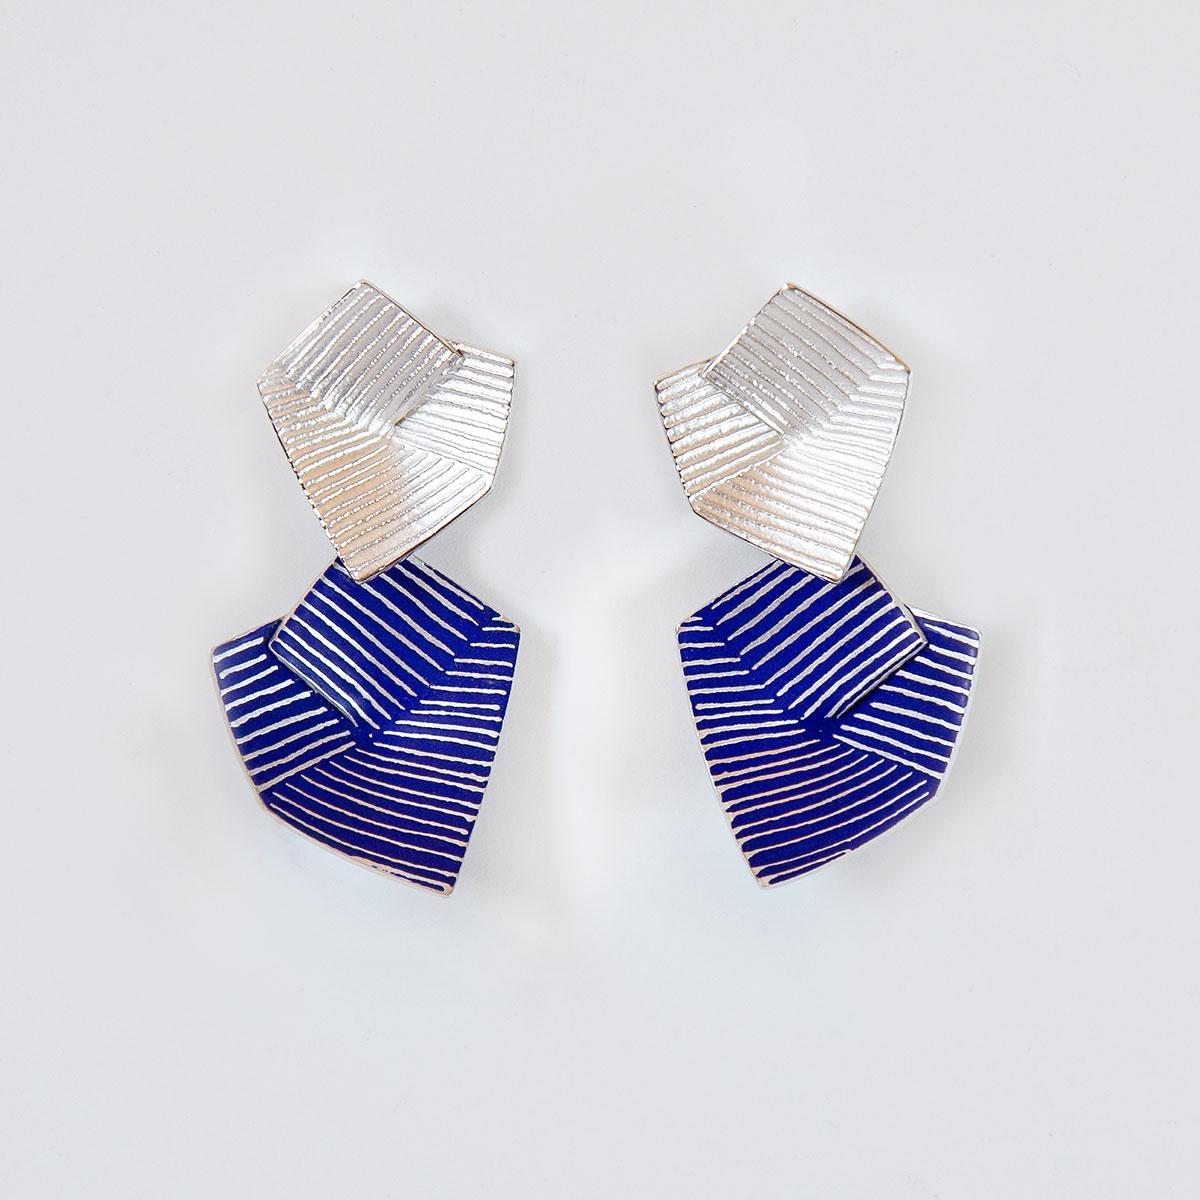 'Lines in Motion' Blue Drop Earrings, Large